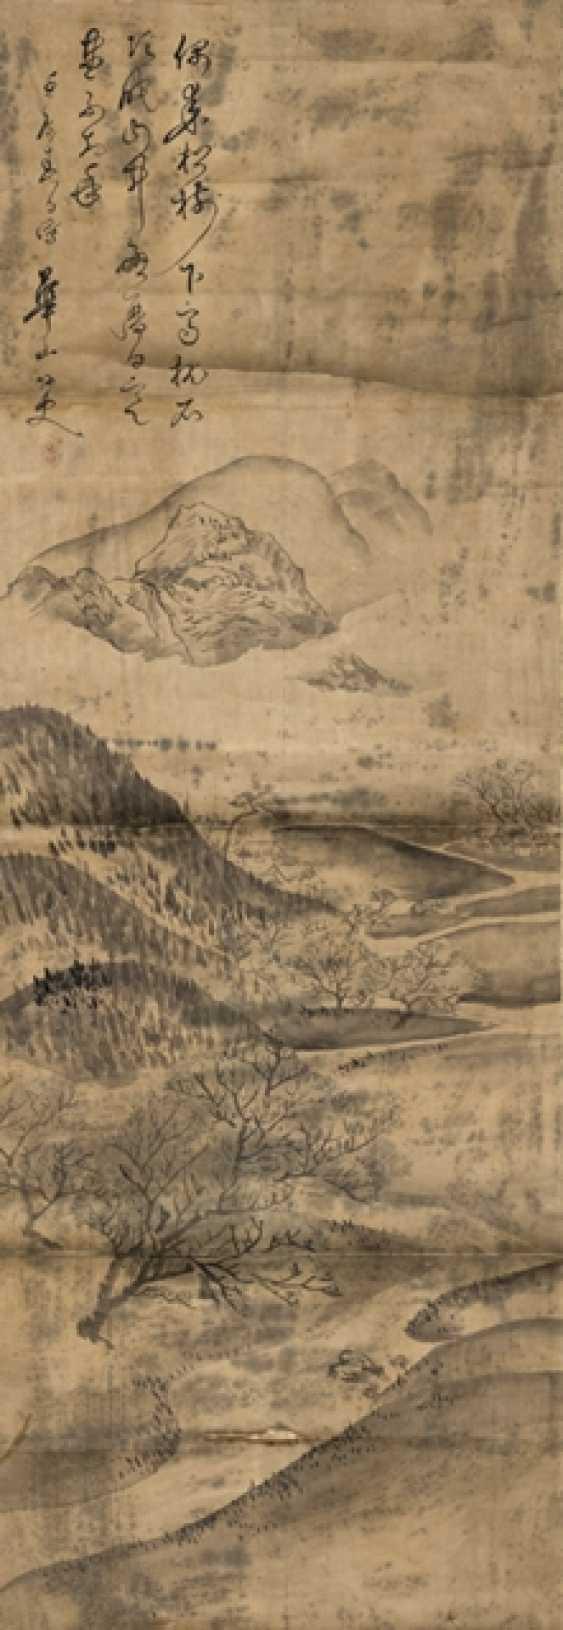 Three Landscape Paintings - photo 1